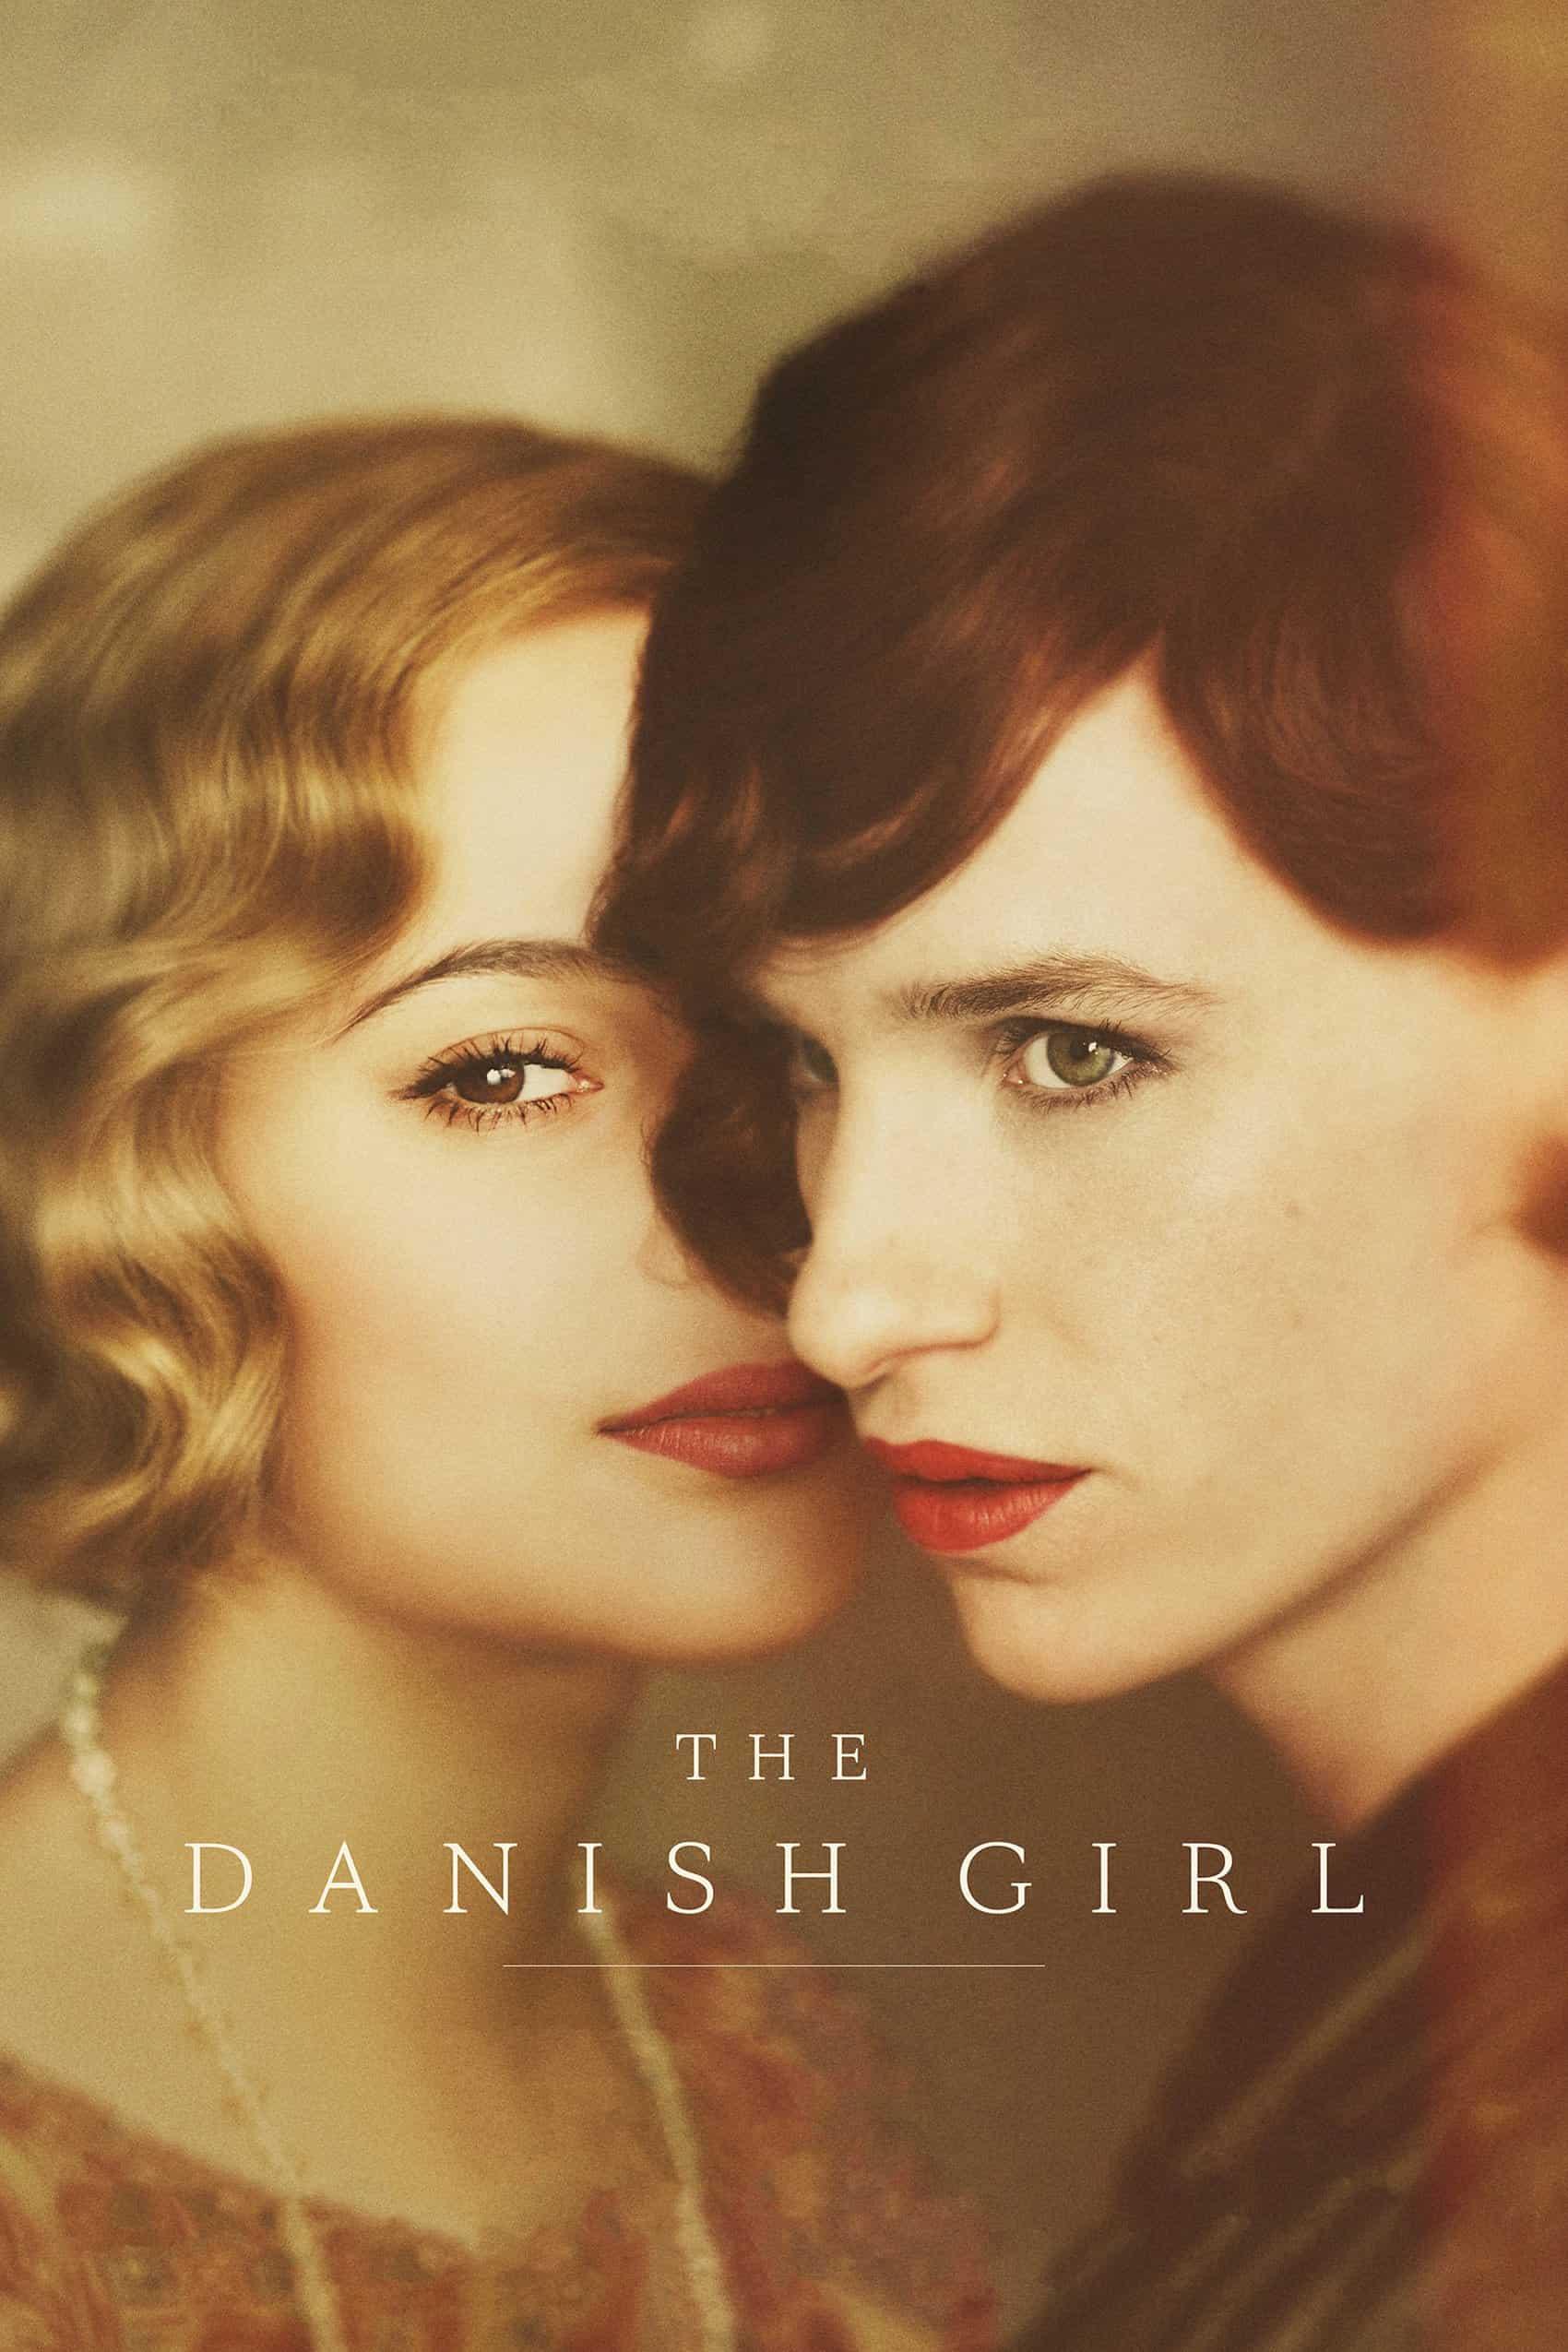 The Danish Girl, 2015